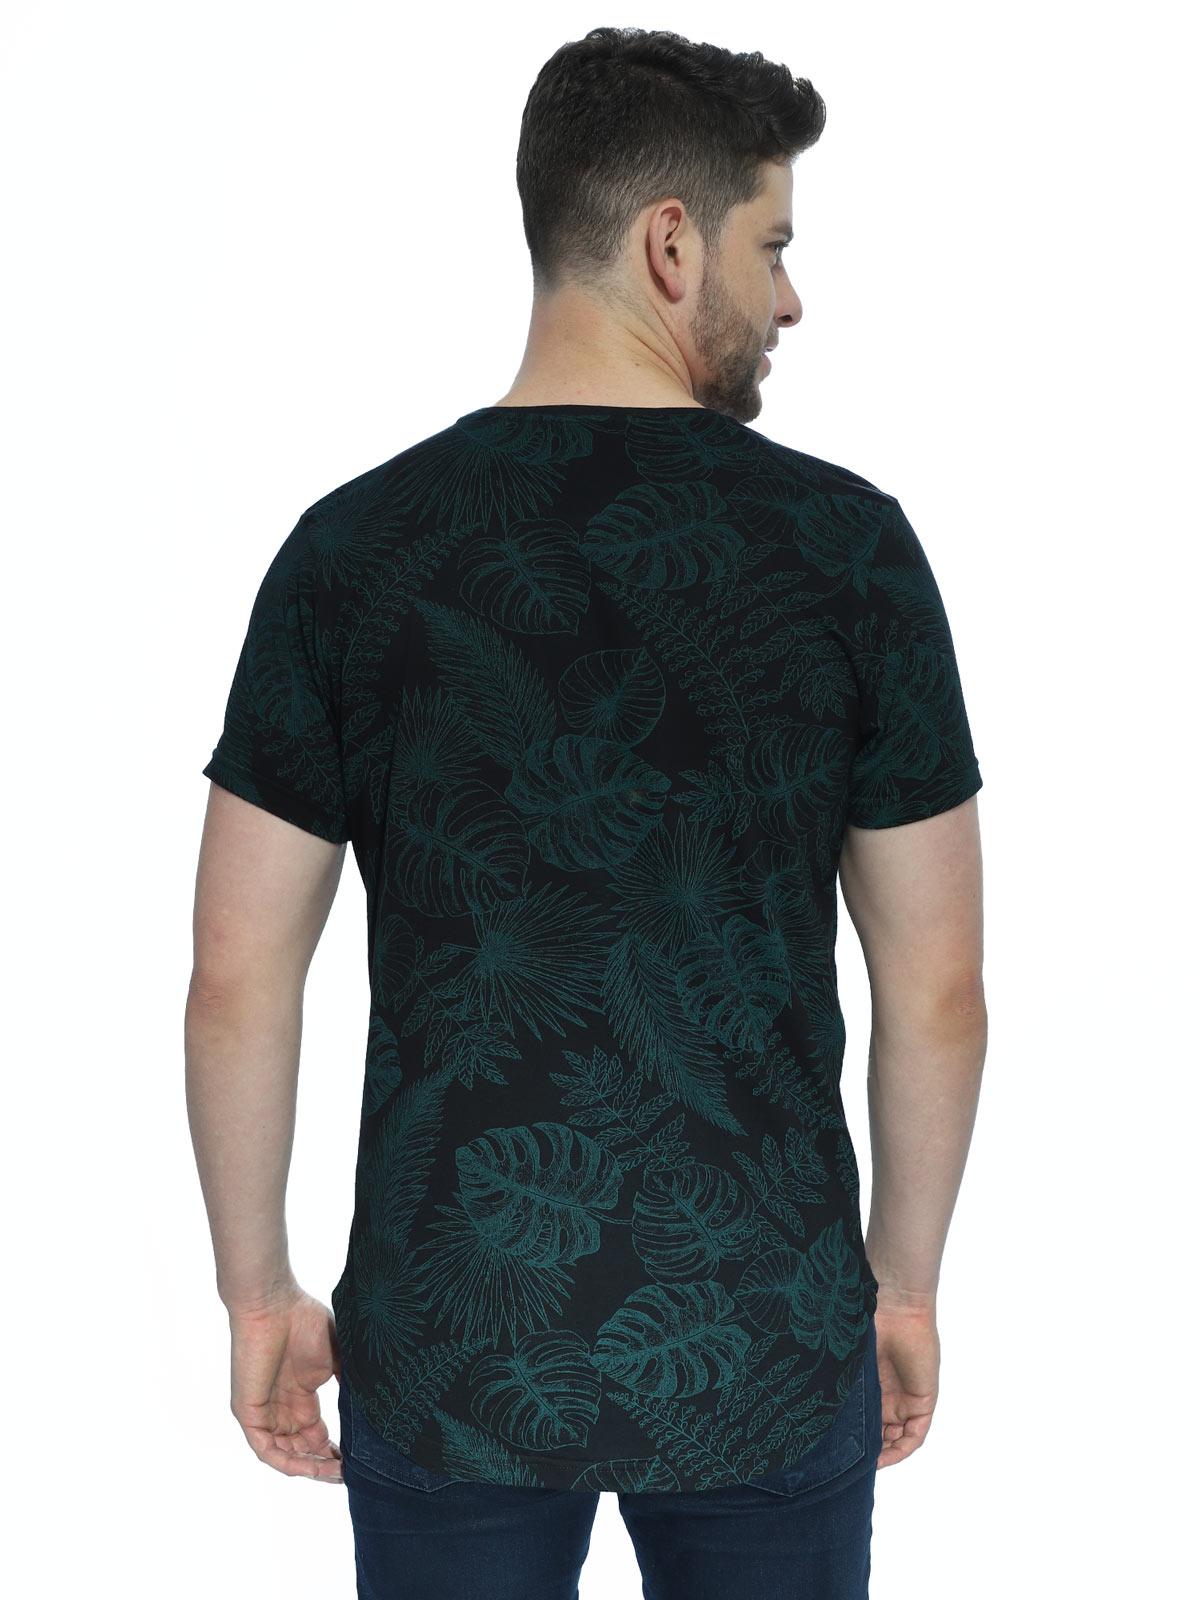 Camiseta Masculina Longline Swag Manga Curta Floral Preta